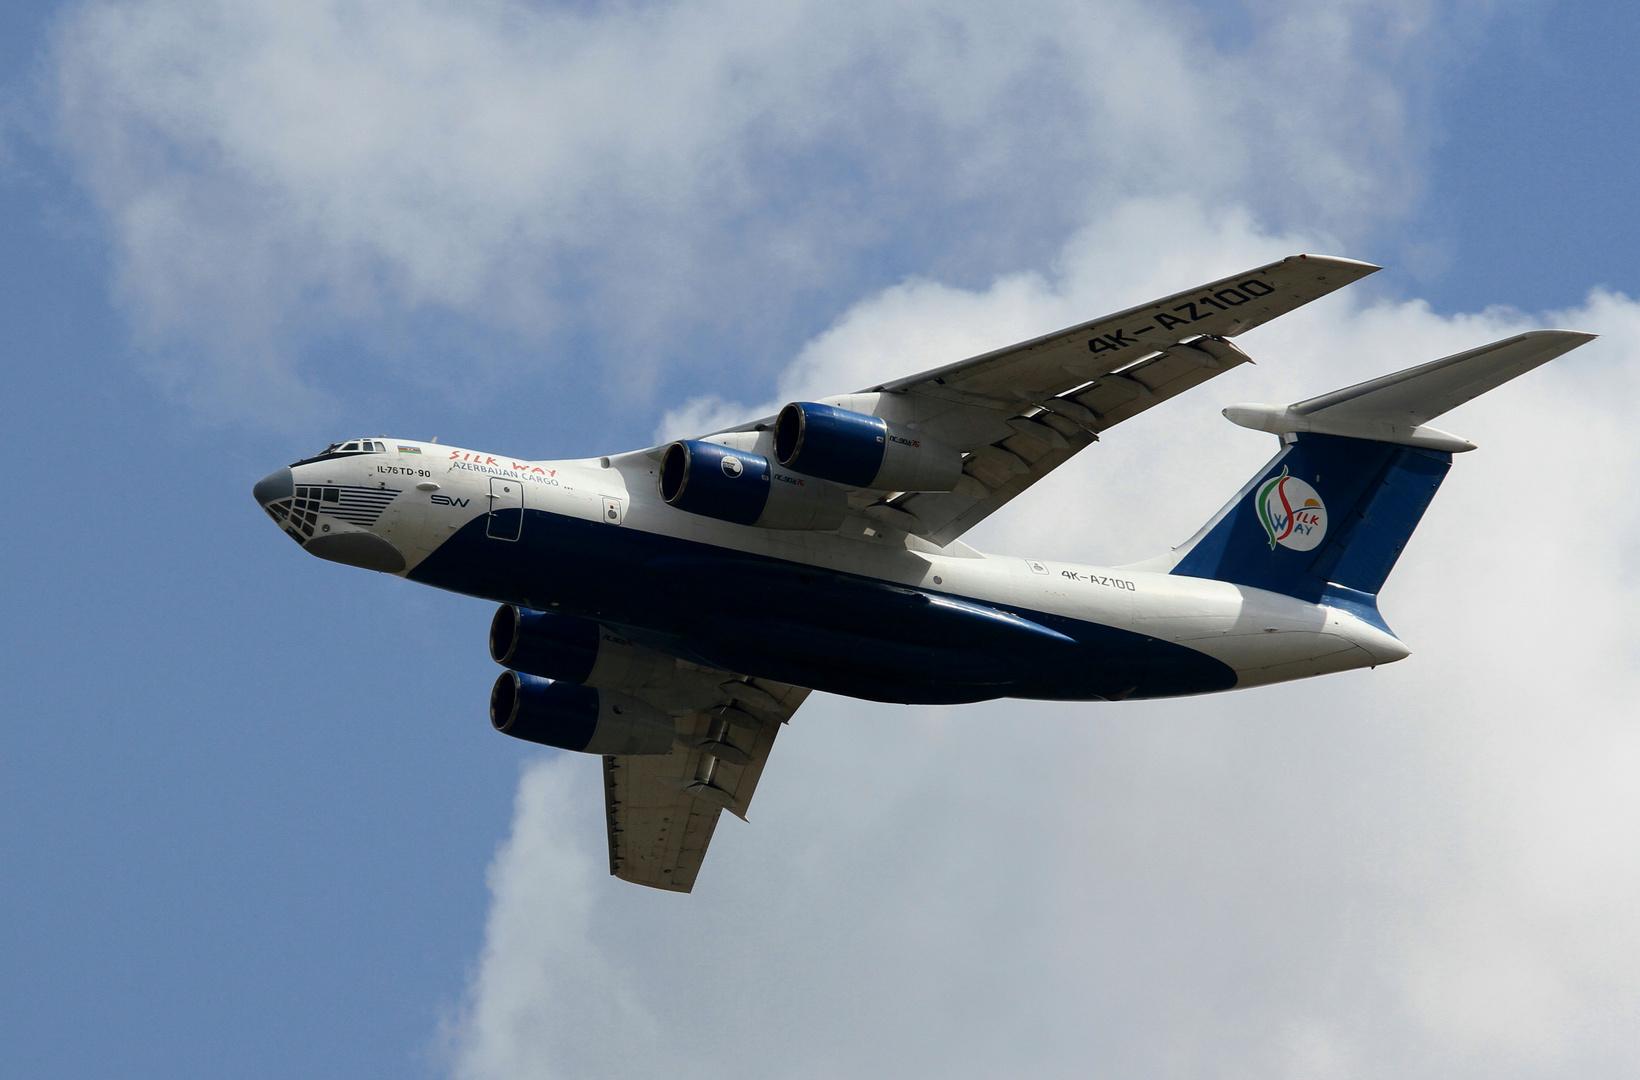 Silk Way Airlines 4K-AZ 100